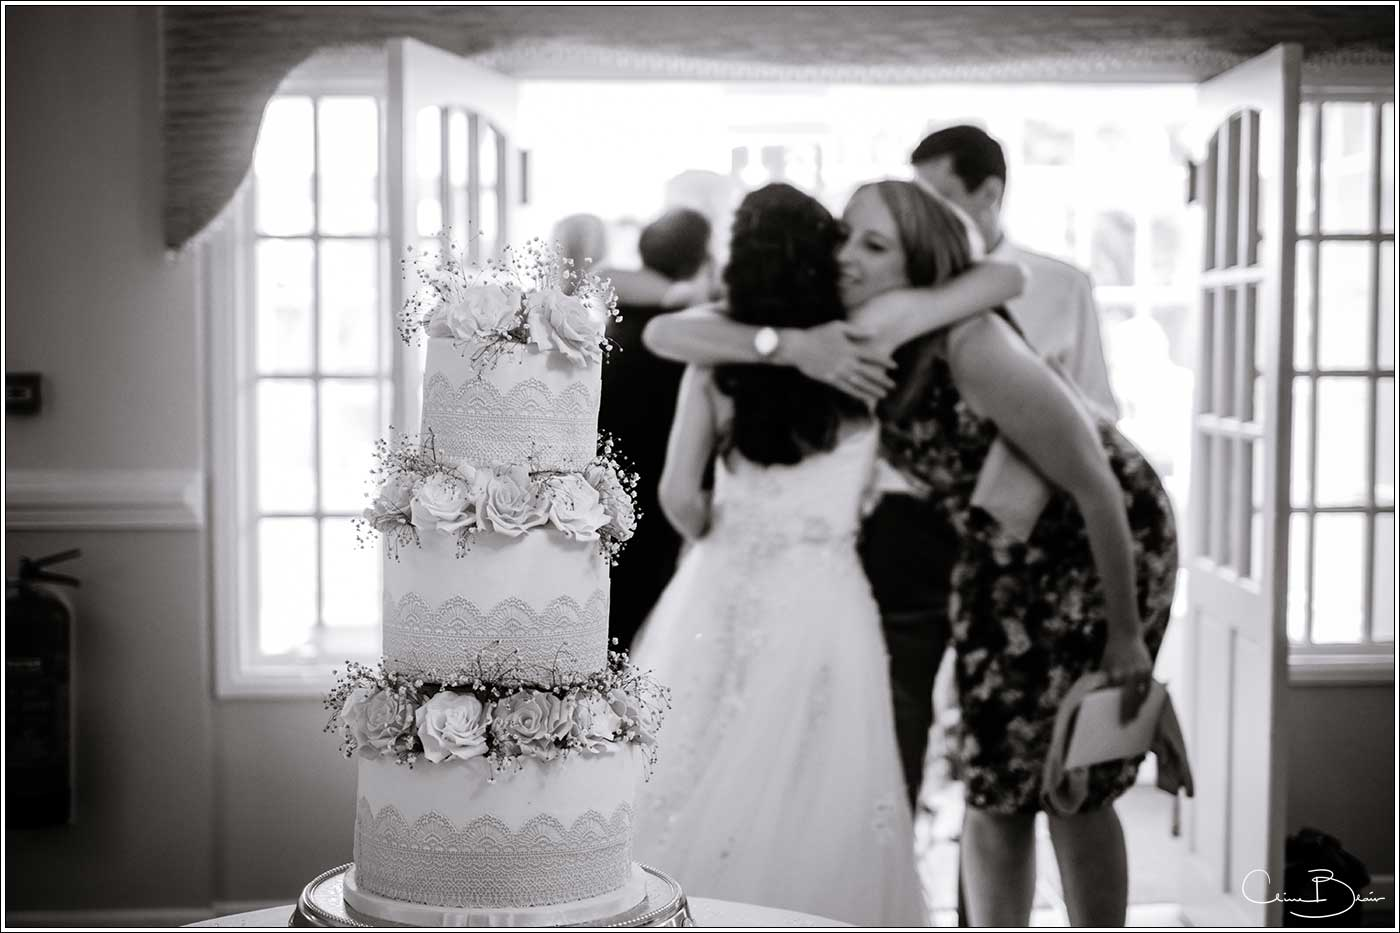 Wedding cake: Bank House Wedding Photographer Clive Blair Photography. Documentary Birmingham Wedding Photographer